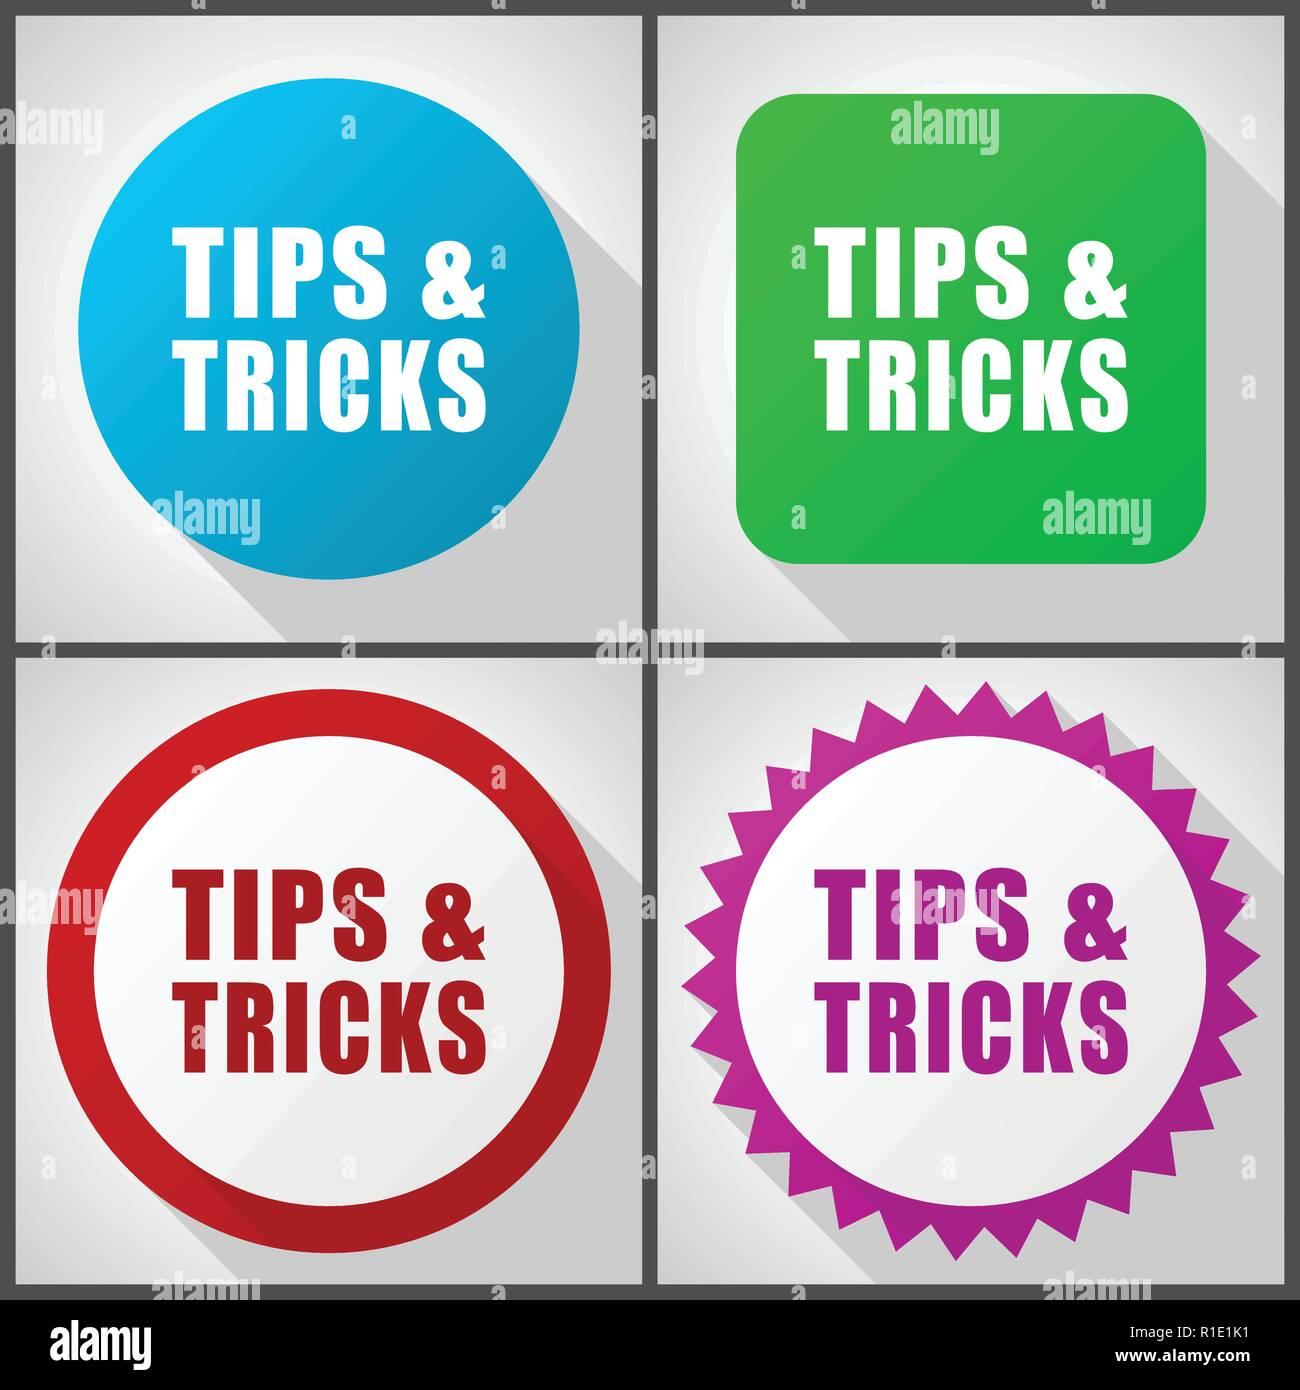 Designer Tips And Tricks For: Tips Tricks Icon Flat Icon Stock Photos & Tips Tricks Icon